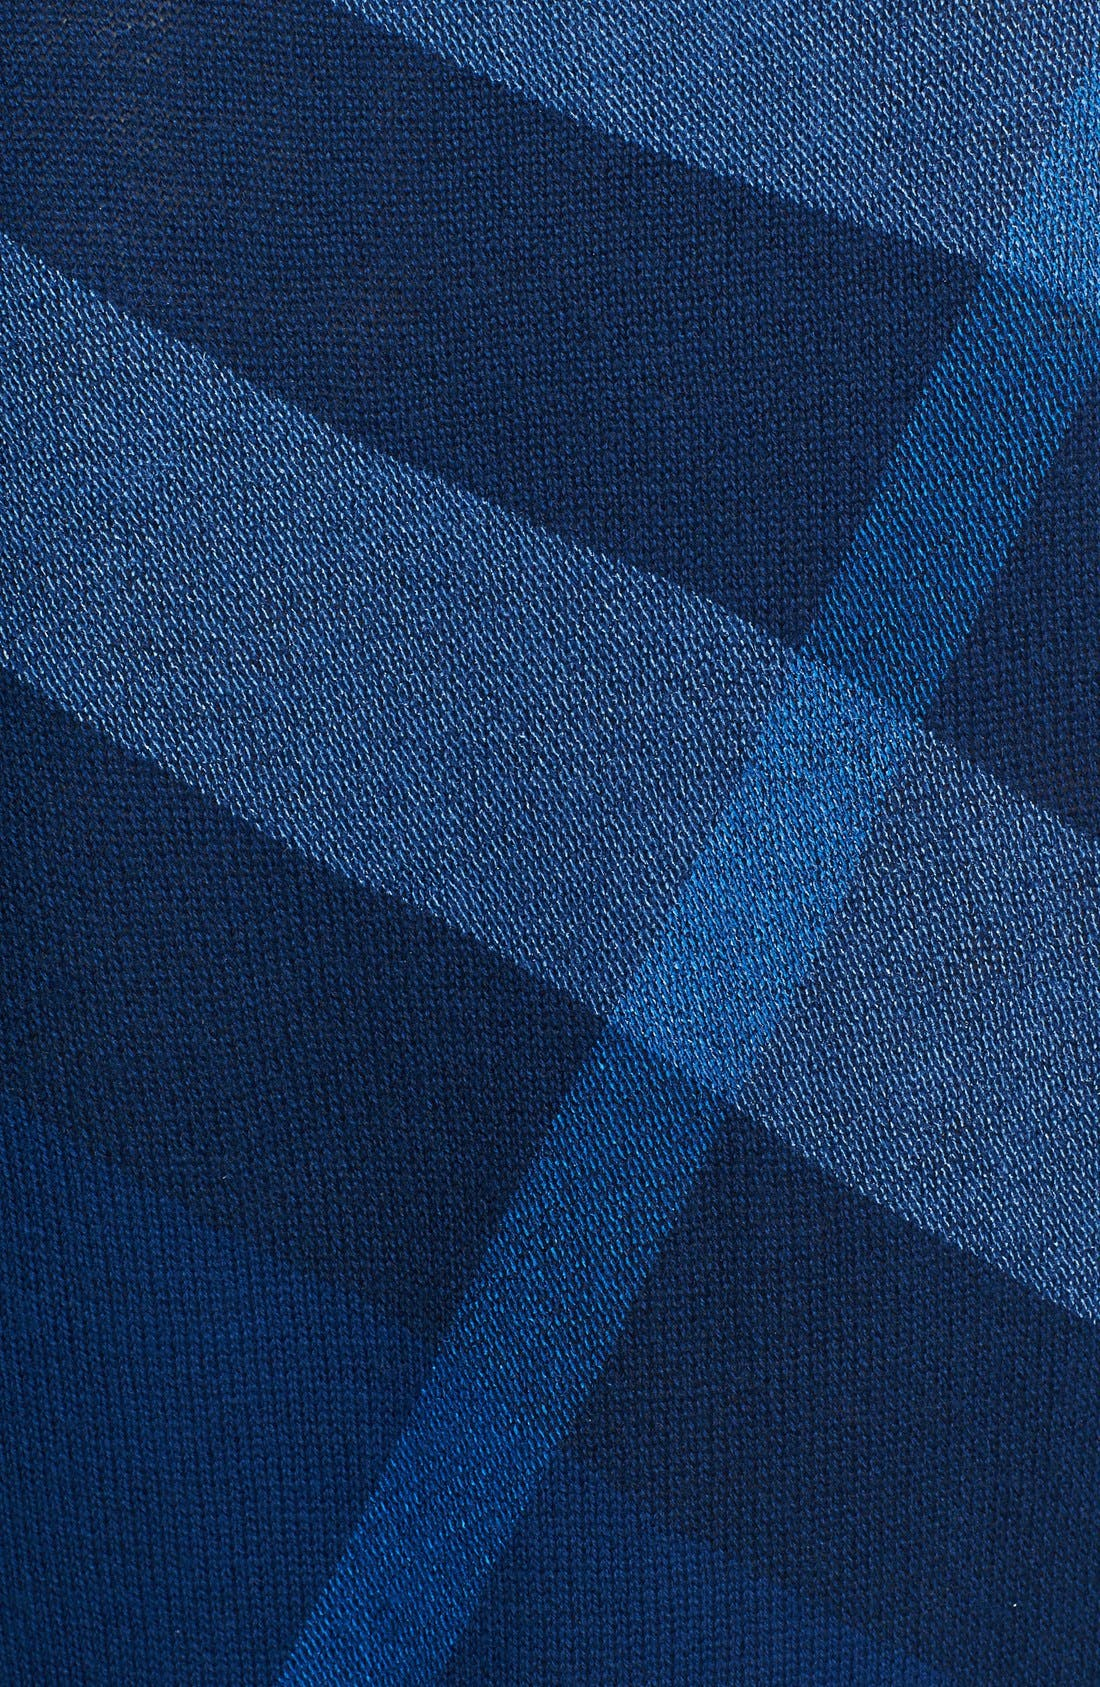 Alternate Image 3  - Burberry Brit Check Pattern Merino & Cashmere Sweater